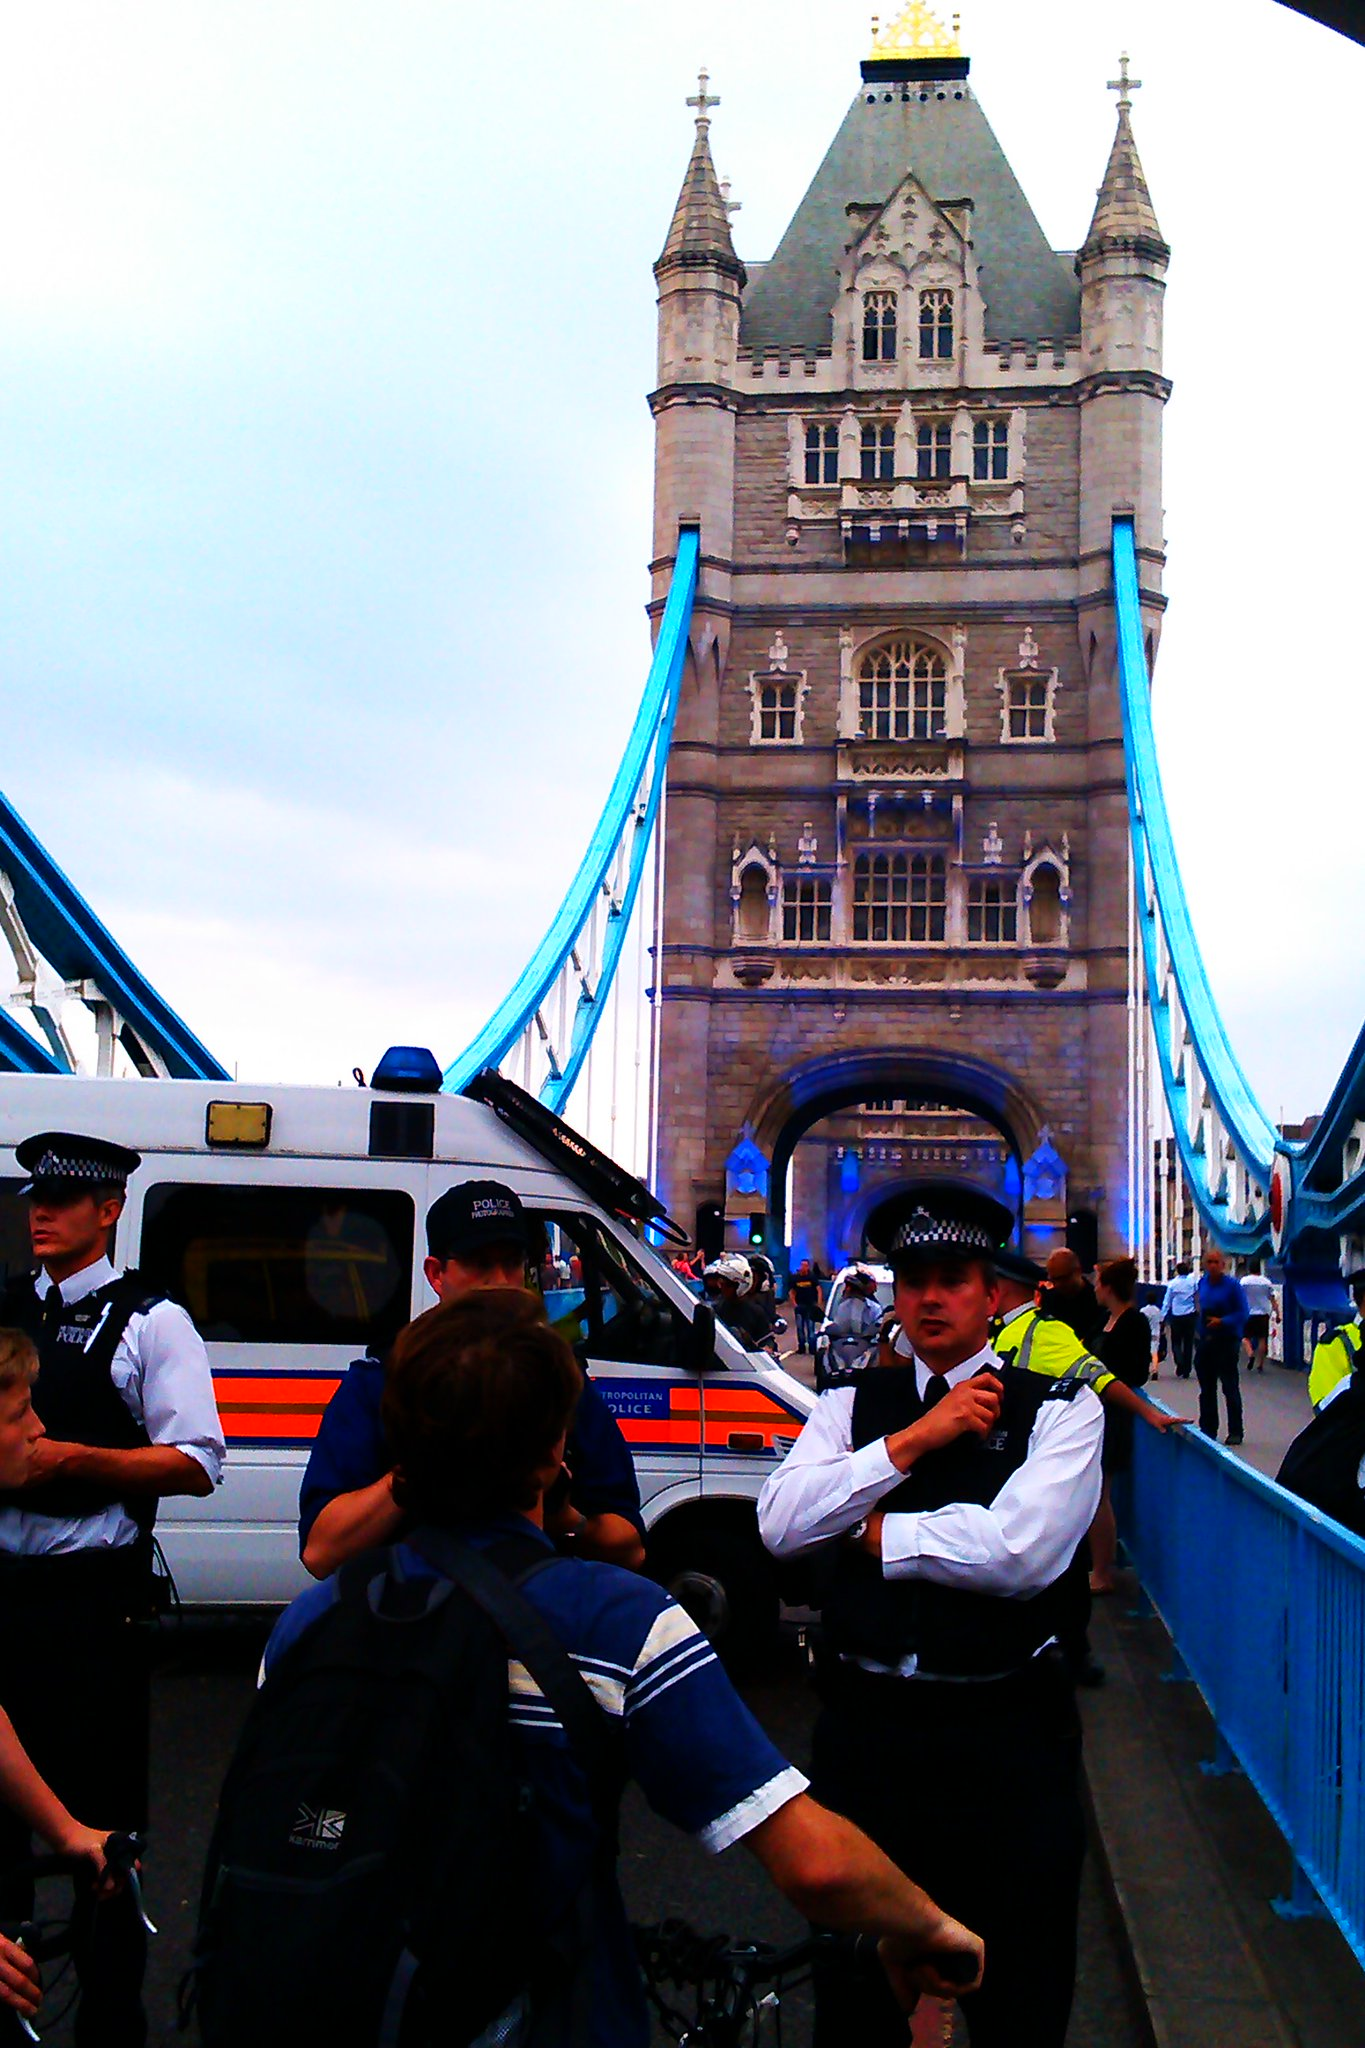 RT @aymanscribbler: Police block London traffic, Tower Bridge #criticalmass #London2012 http://t.co/fX2TLvGc